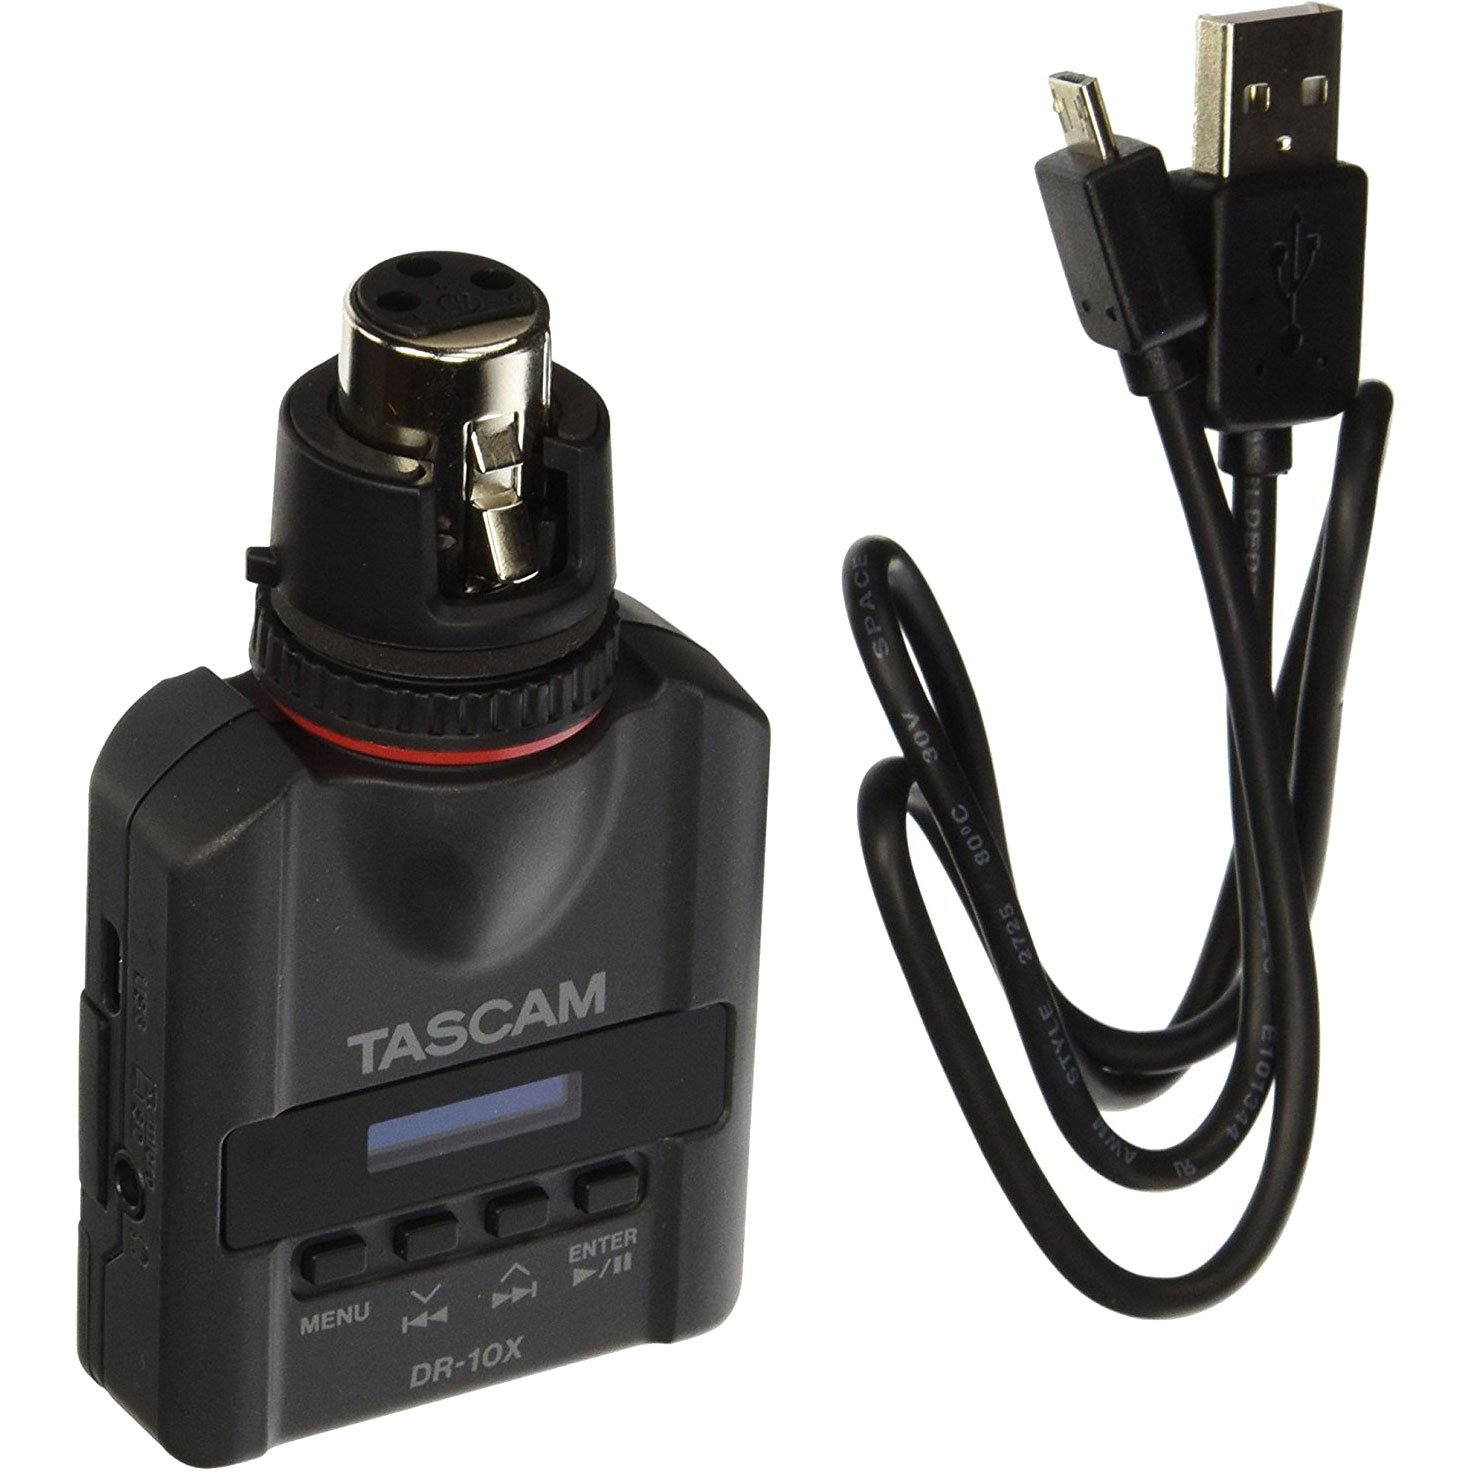 Tascam DR-10X Plug-On Linear PCM Digital Audio Recorder for XLR Microphones